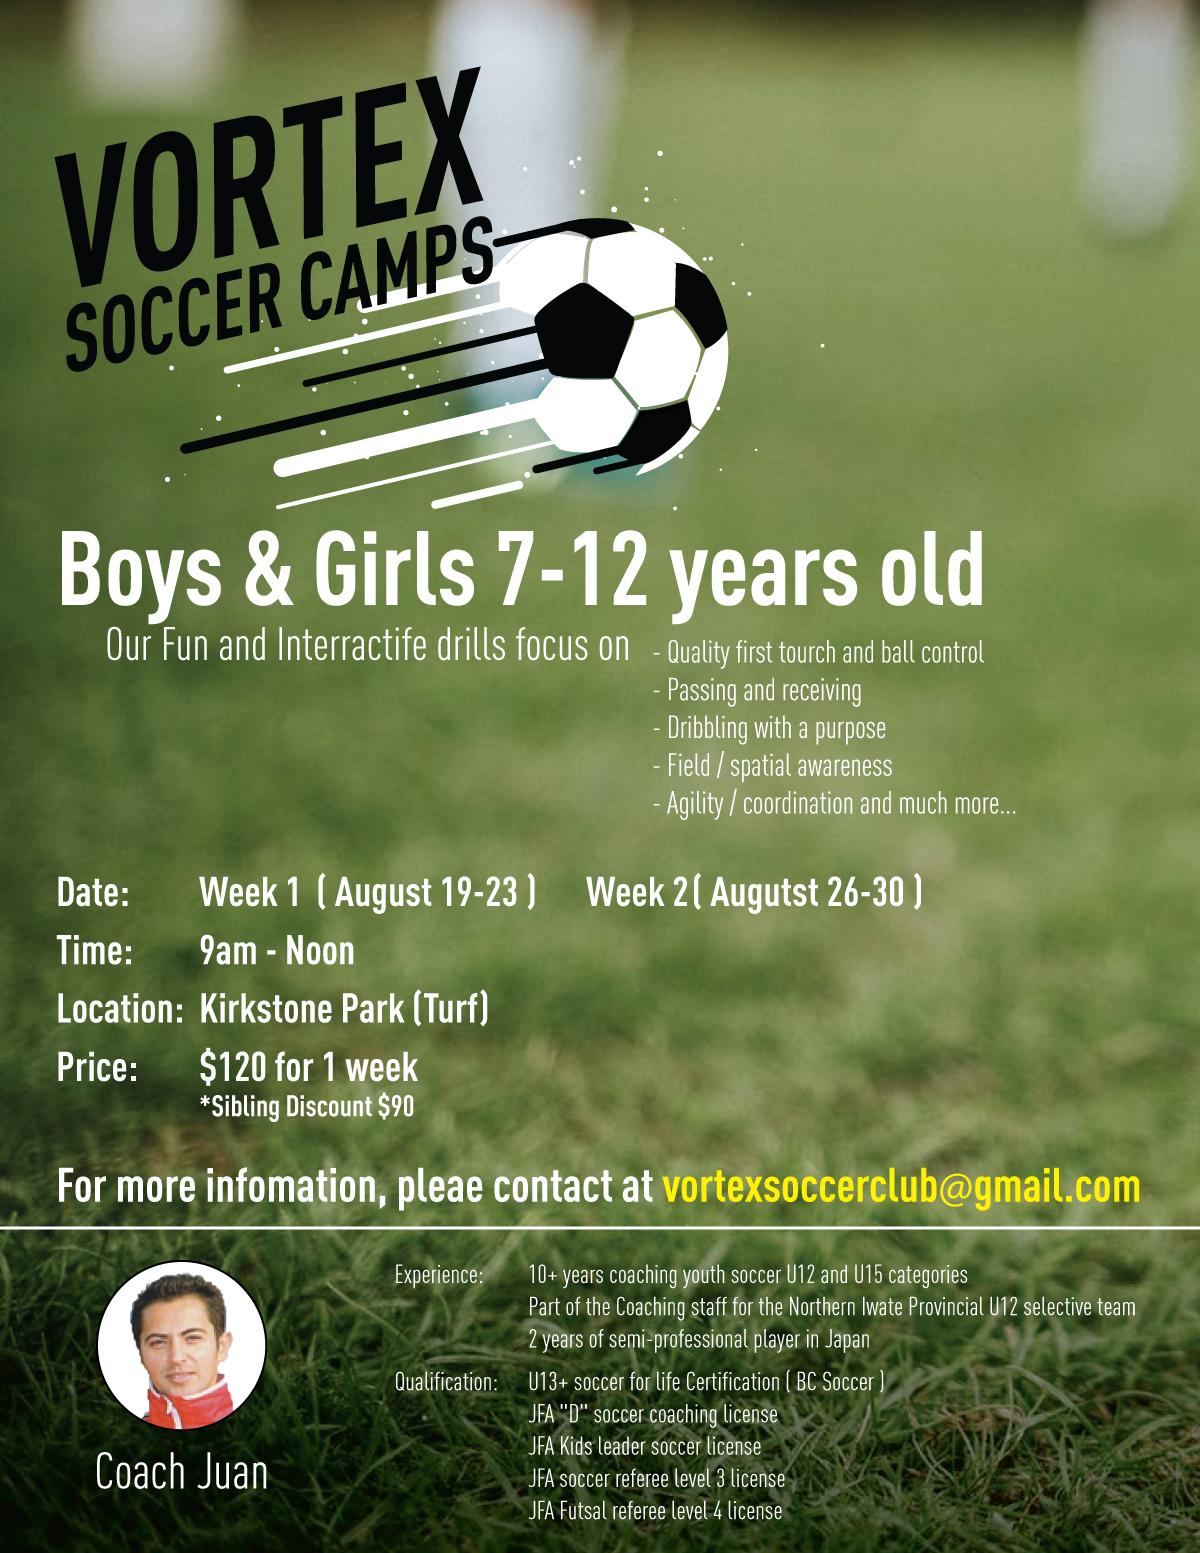 Vortex - Soccer Camp Flyer